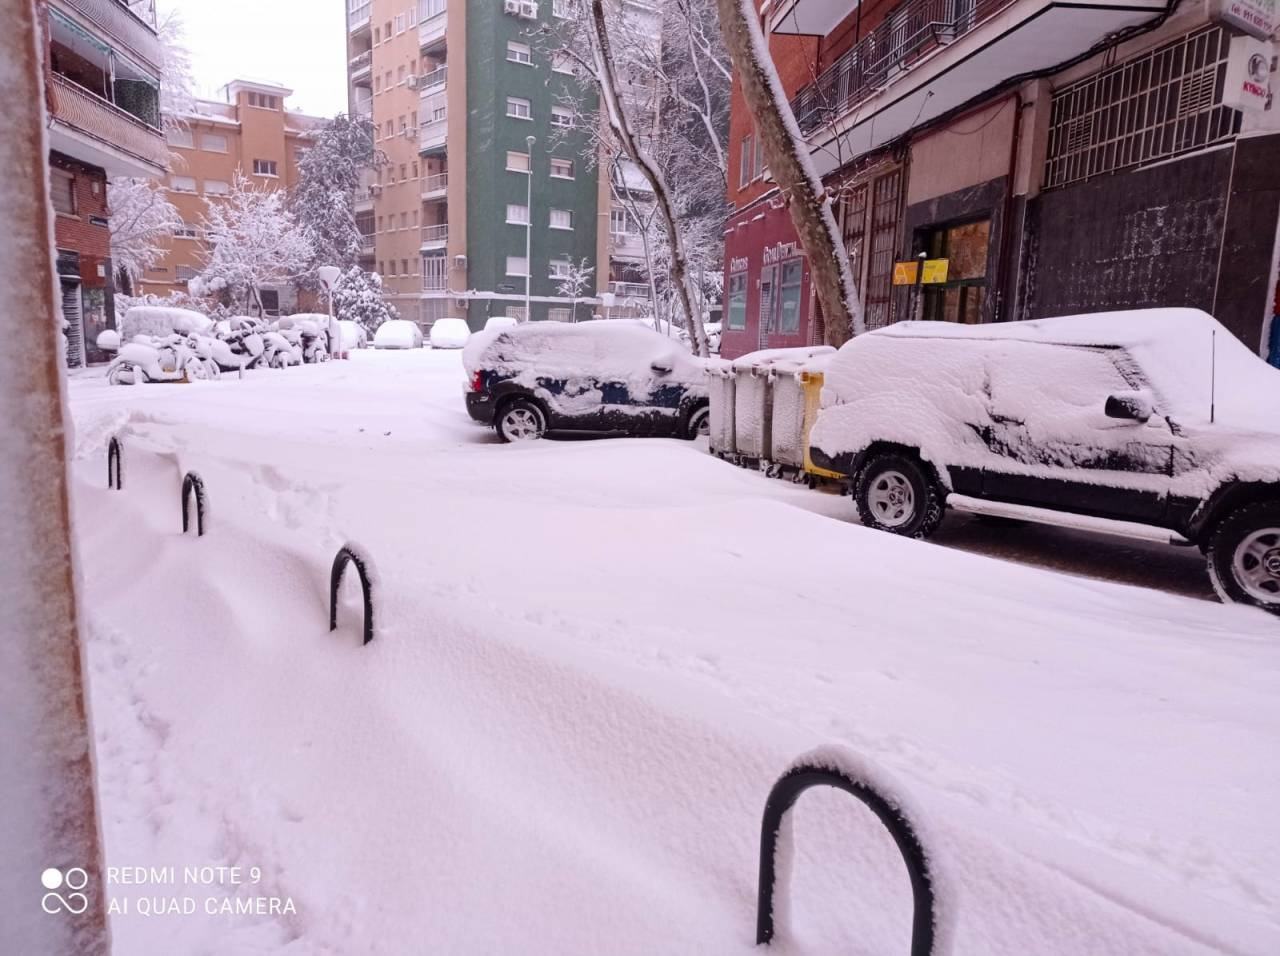 Forte nevicata in corso a Madrid